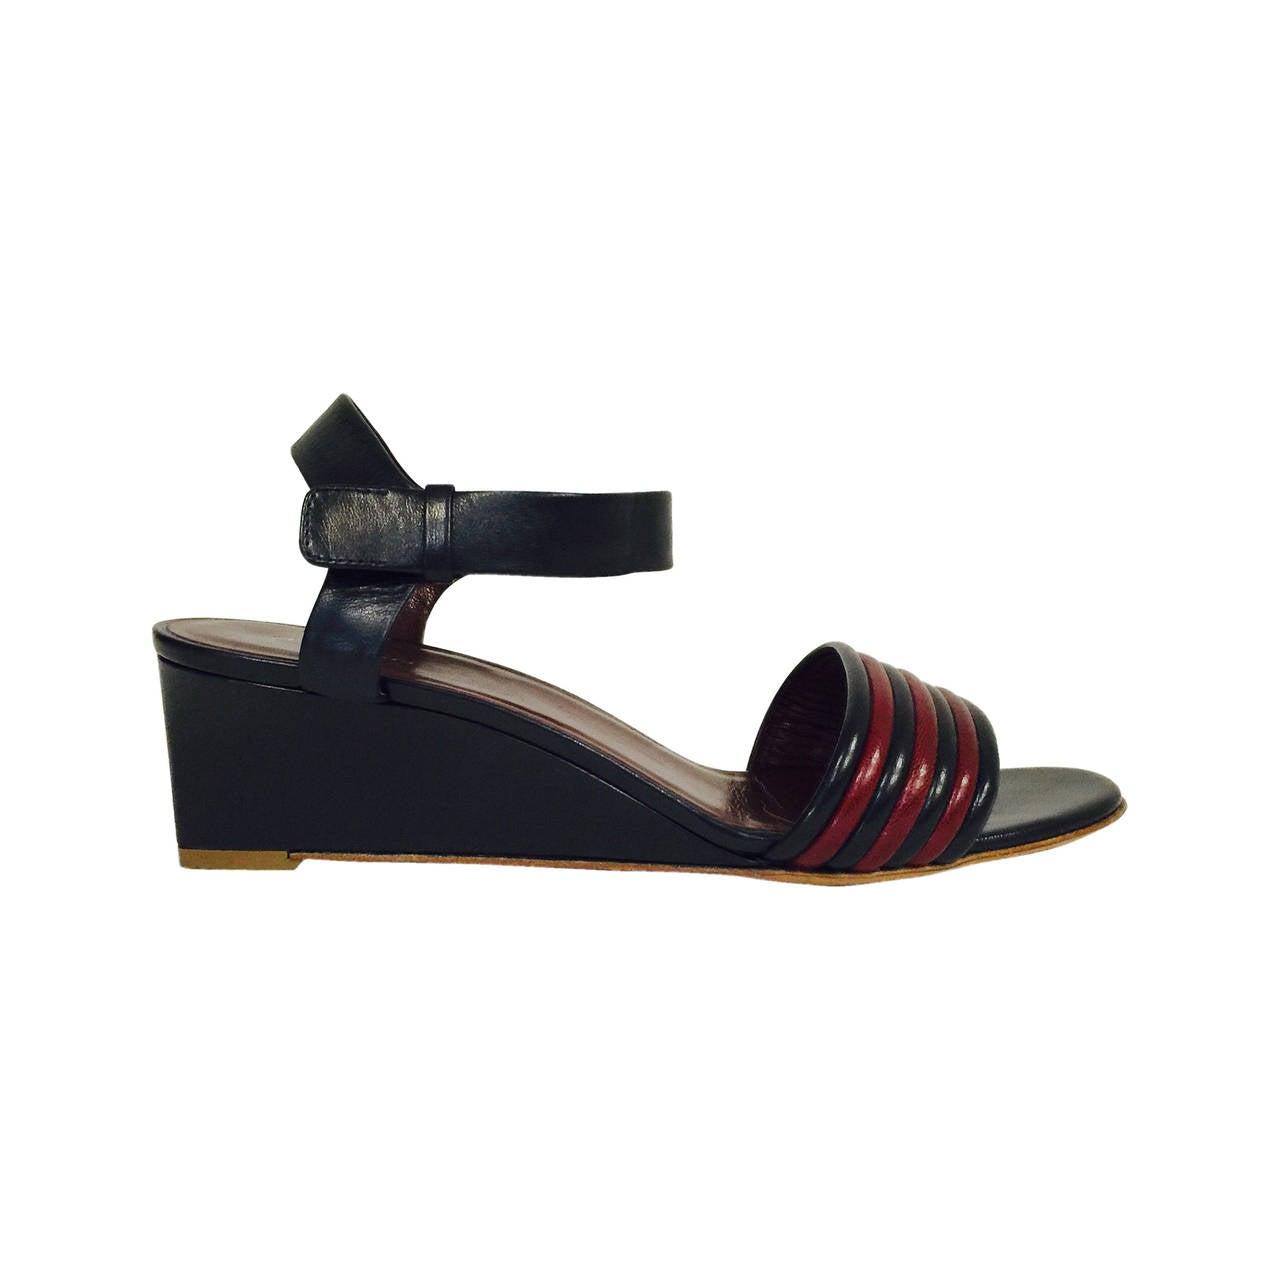 Celine Navy And Burgundy Wedge Sandals At 1stdibs